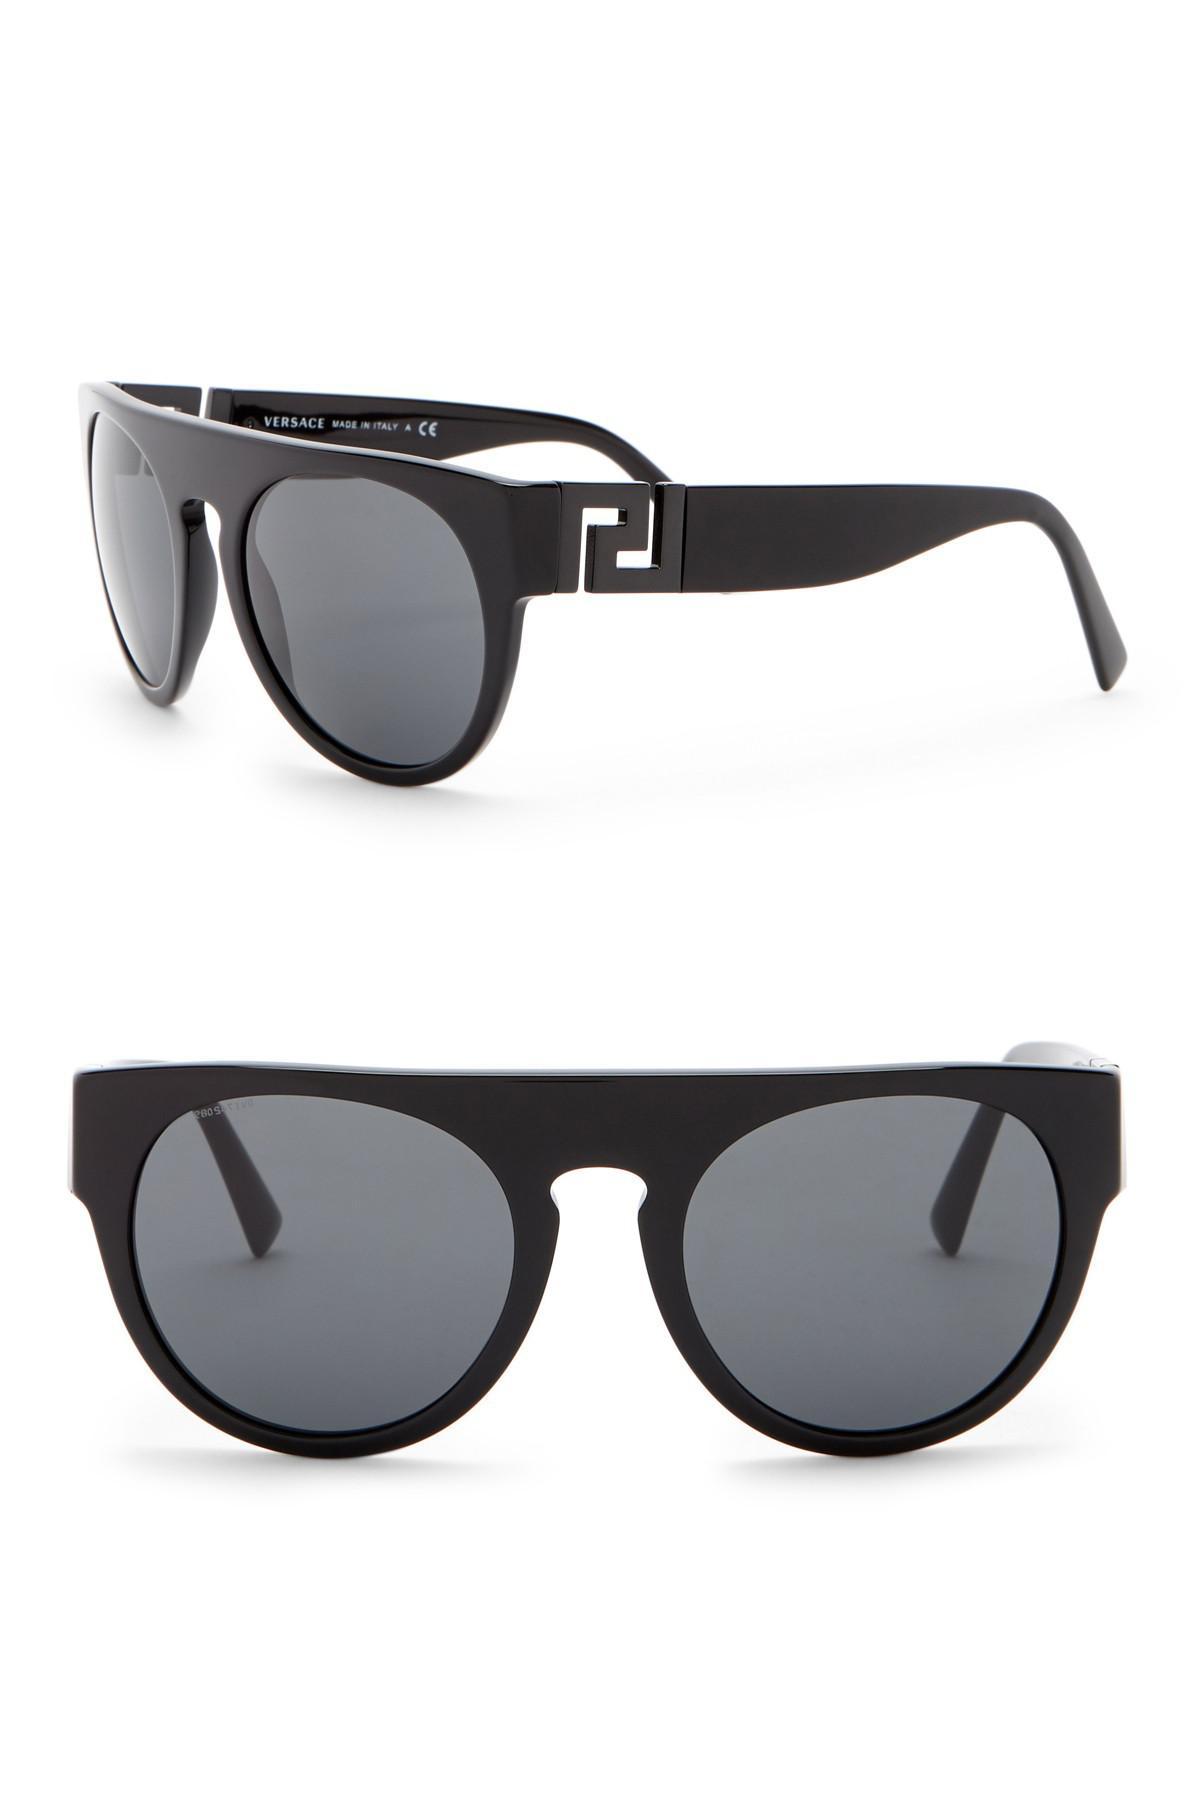 396553fec1b3 Lyst - Versace 55mm Round Sunglasses in Gray for Men